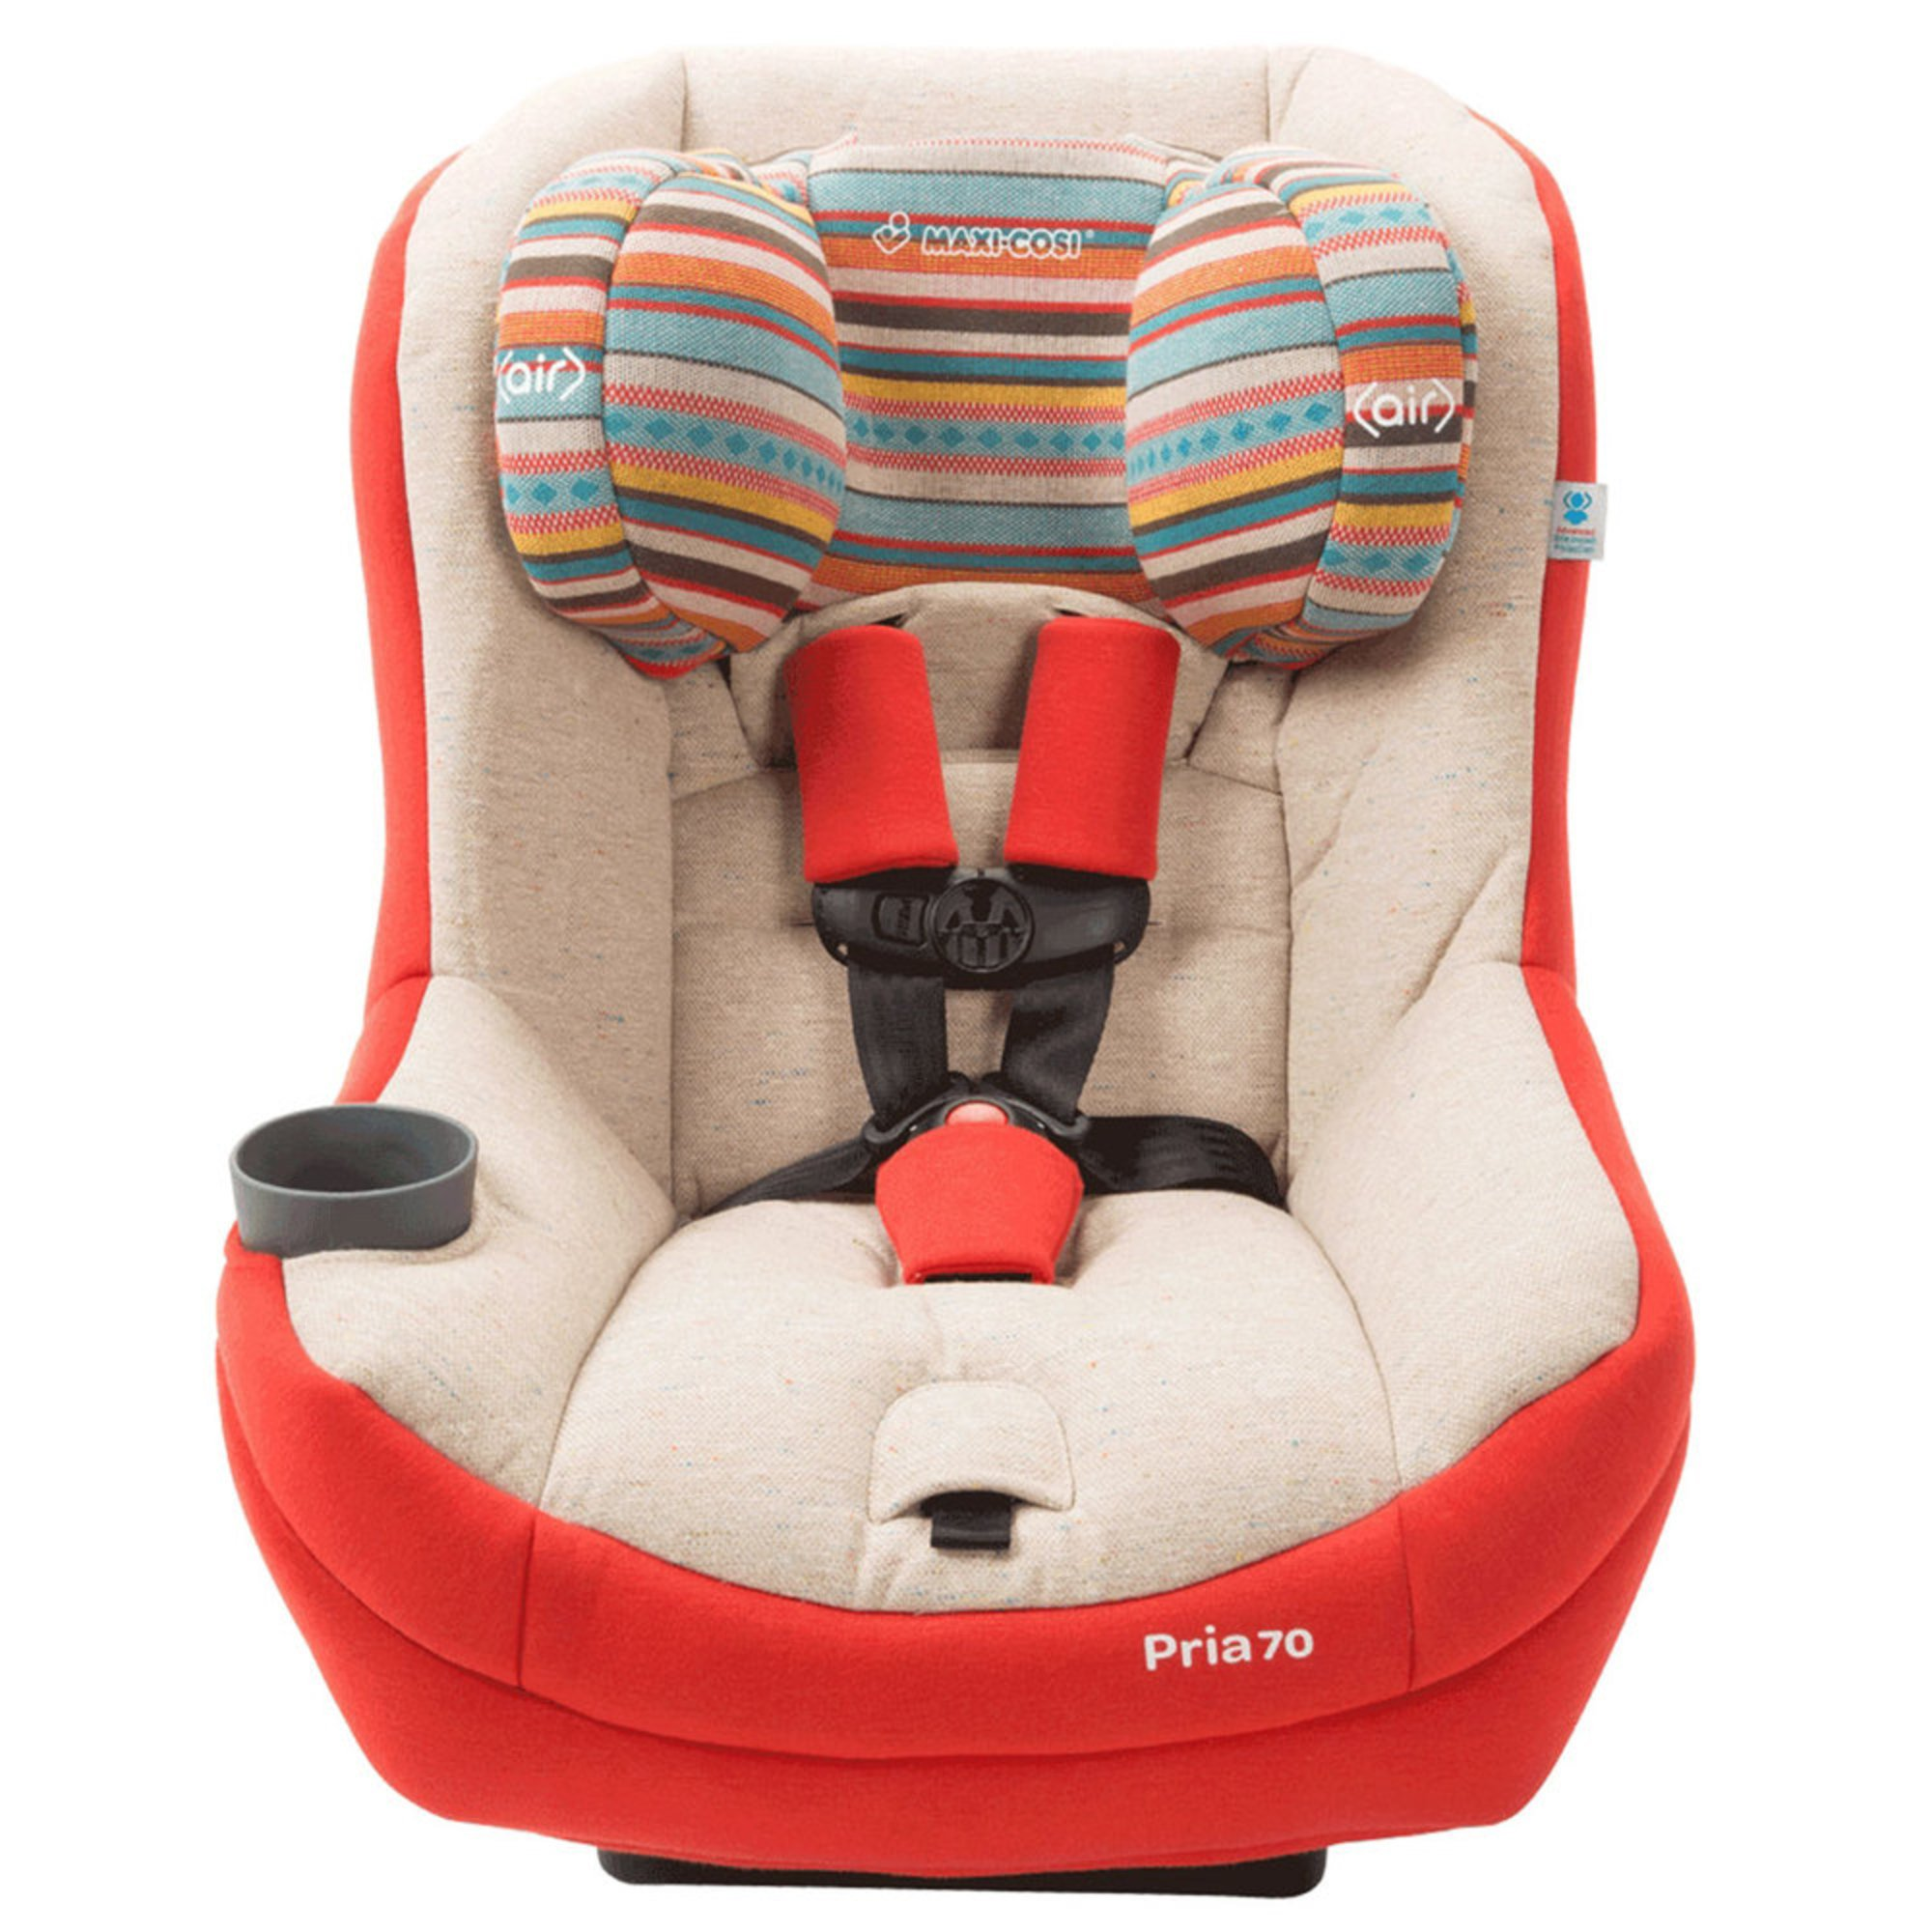 Maxi Cosi Pria 70 Special Edition Convertible Car Seat